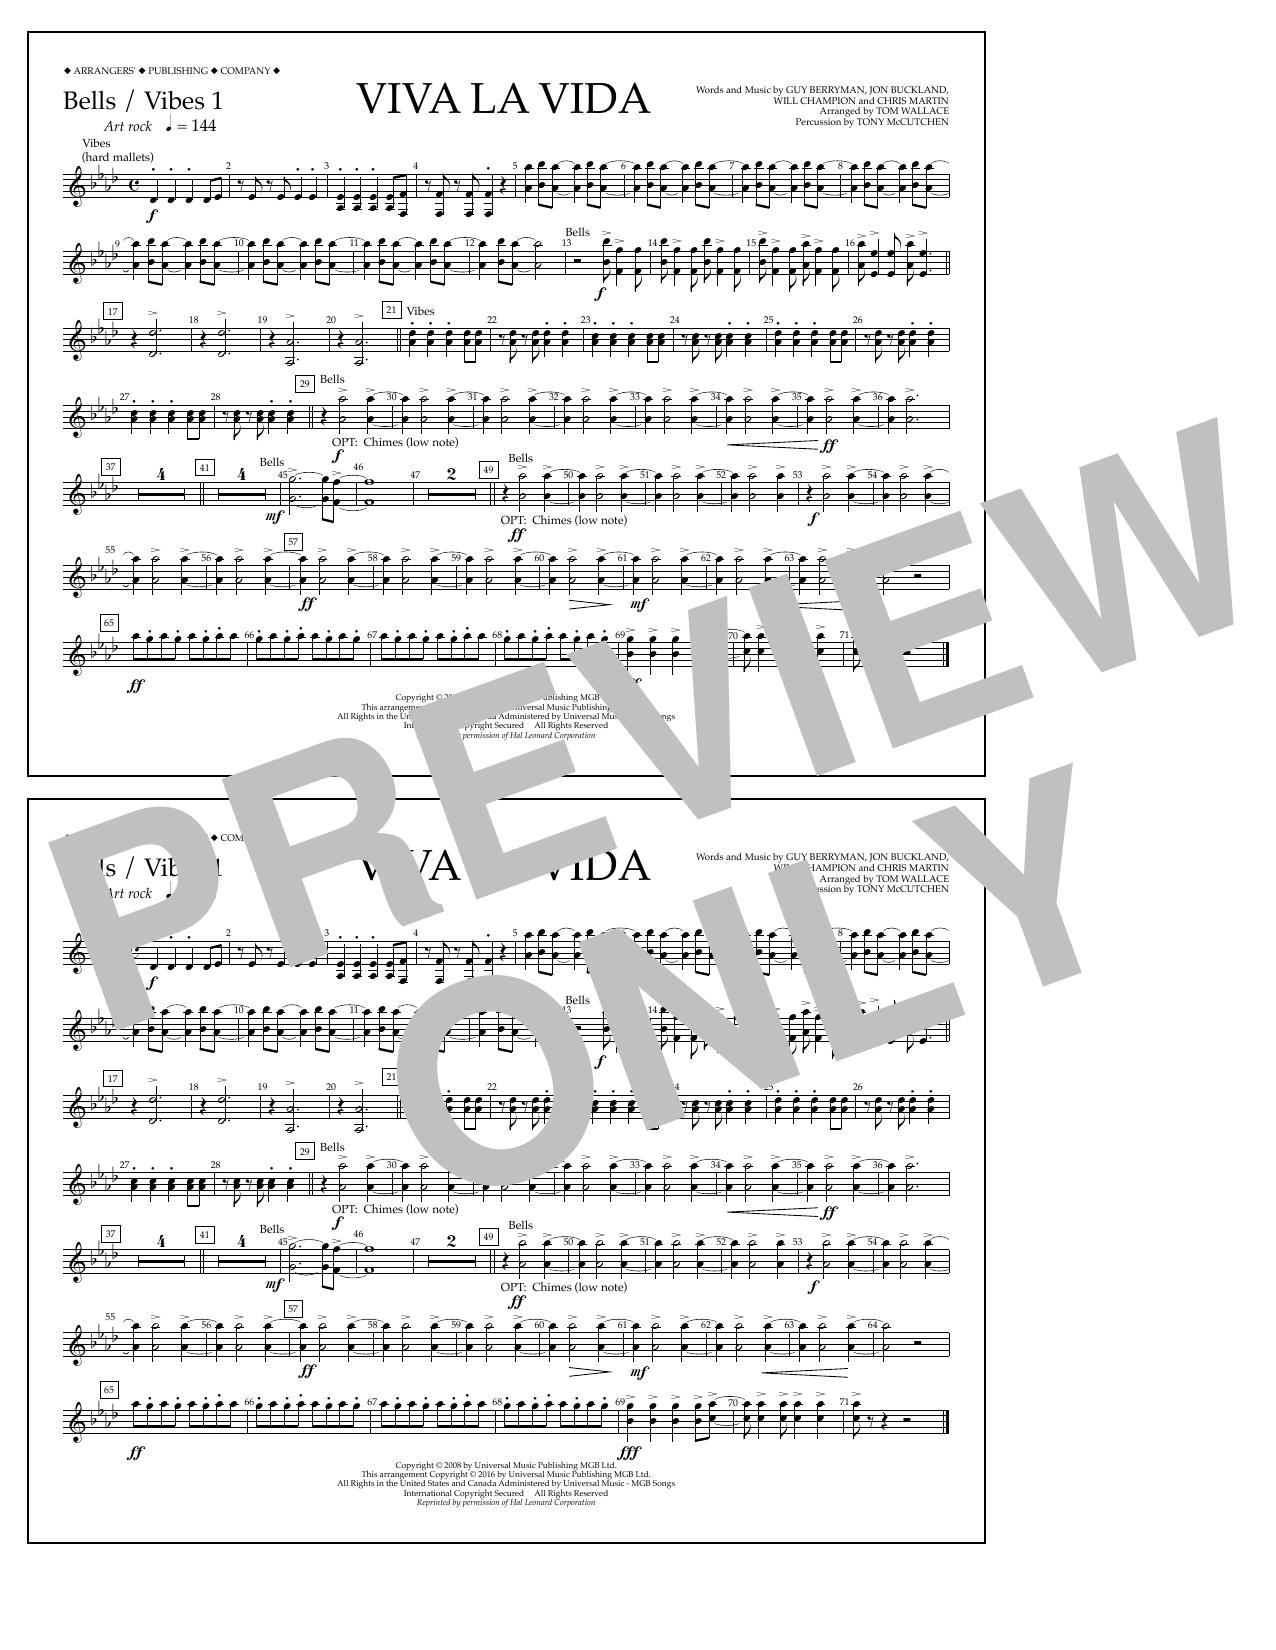 Tom Wallace Viva La Vida - Bells/Vibes 1 sheet music notes and chords. Download Printable PDF.